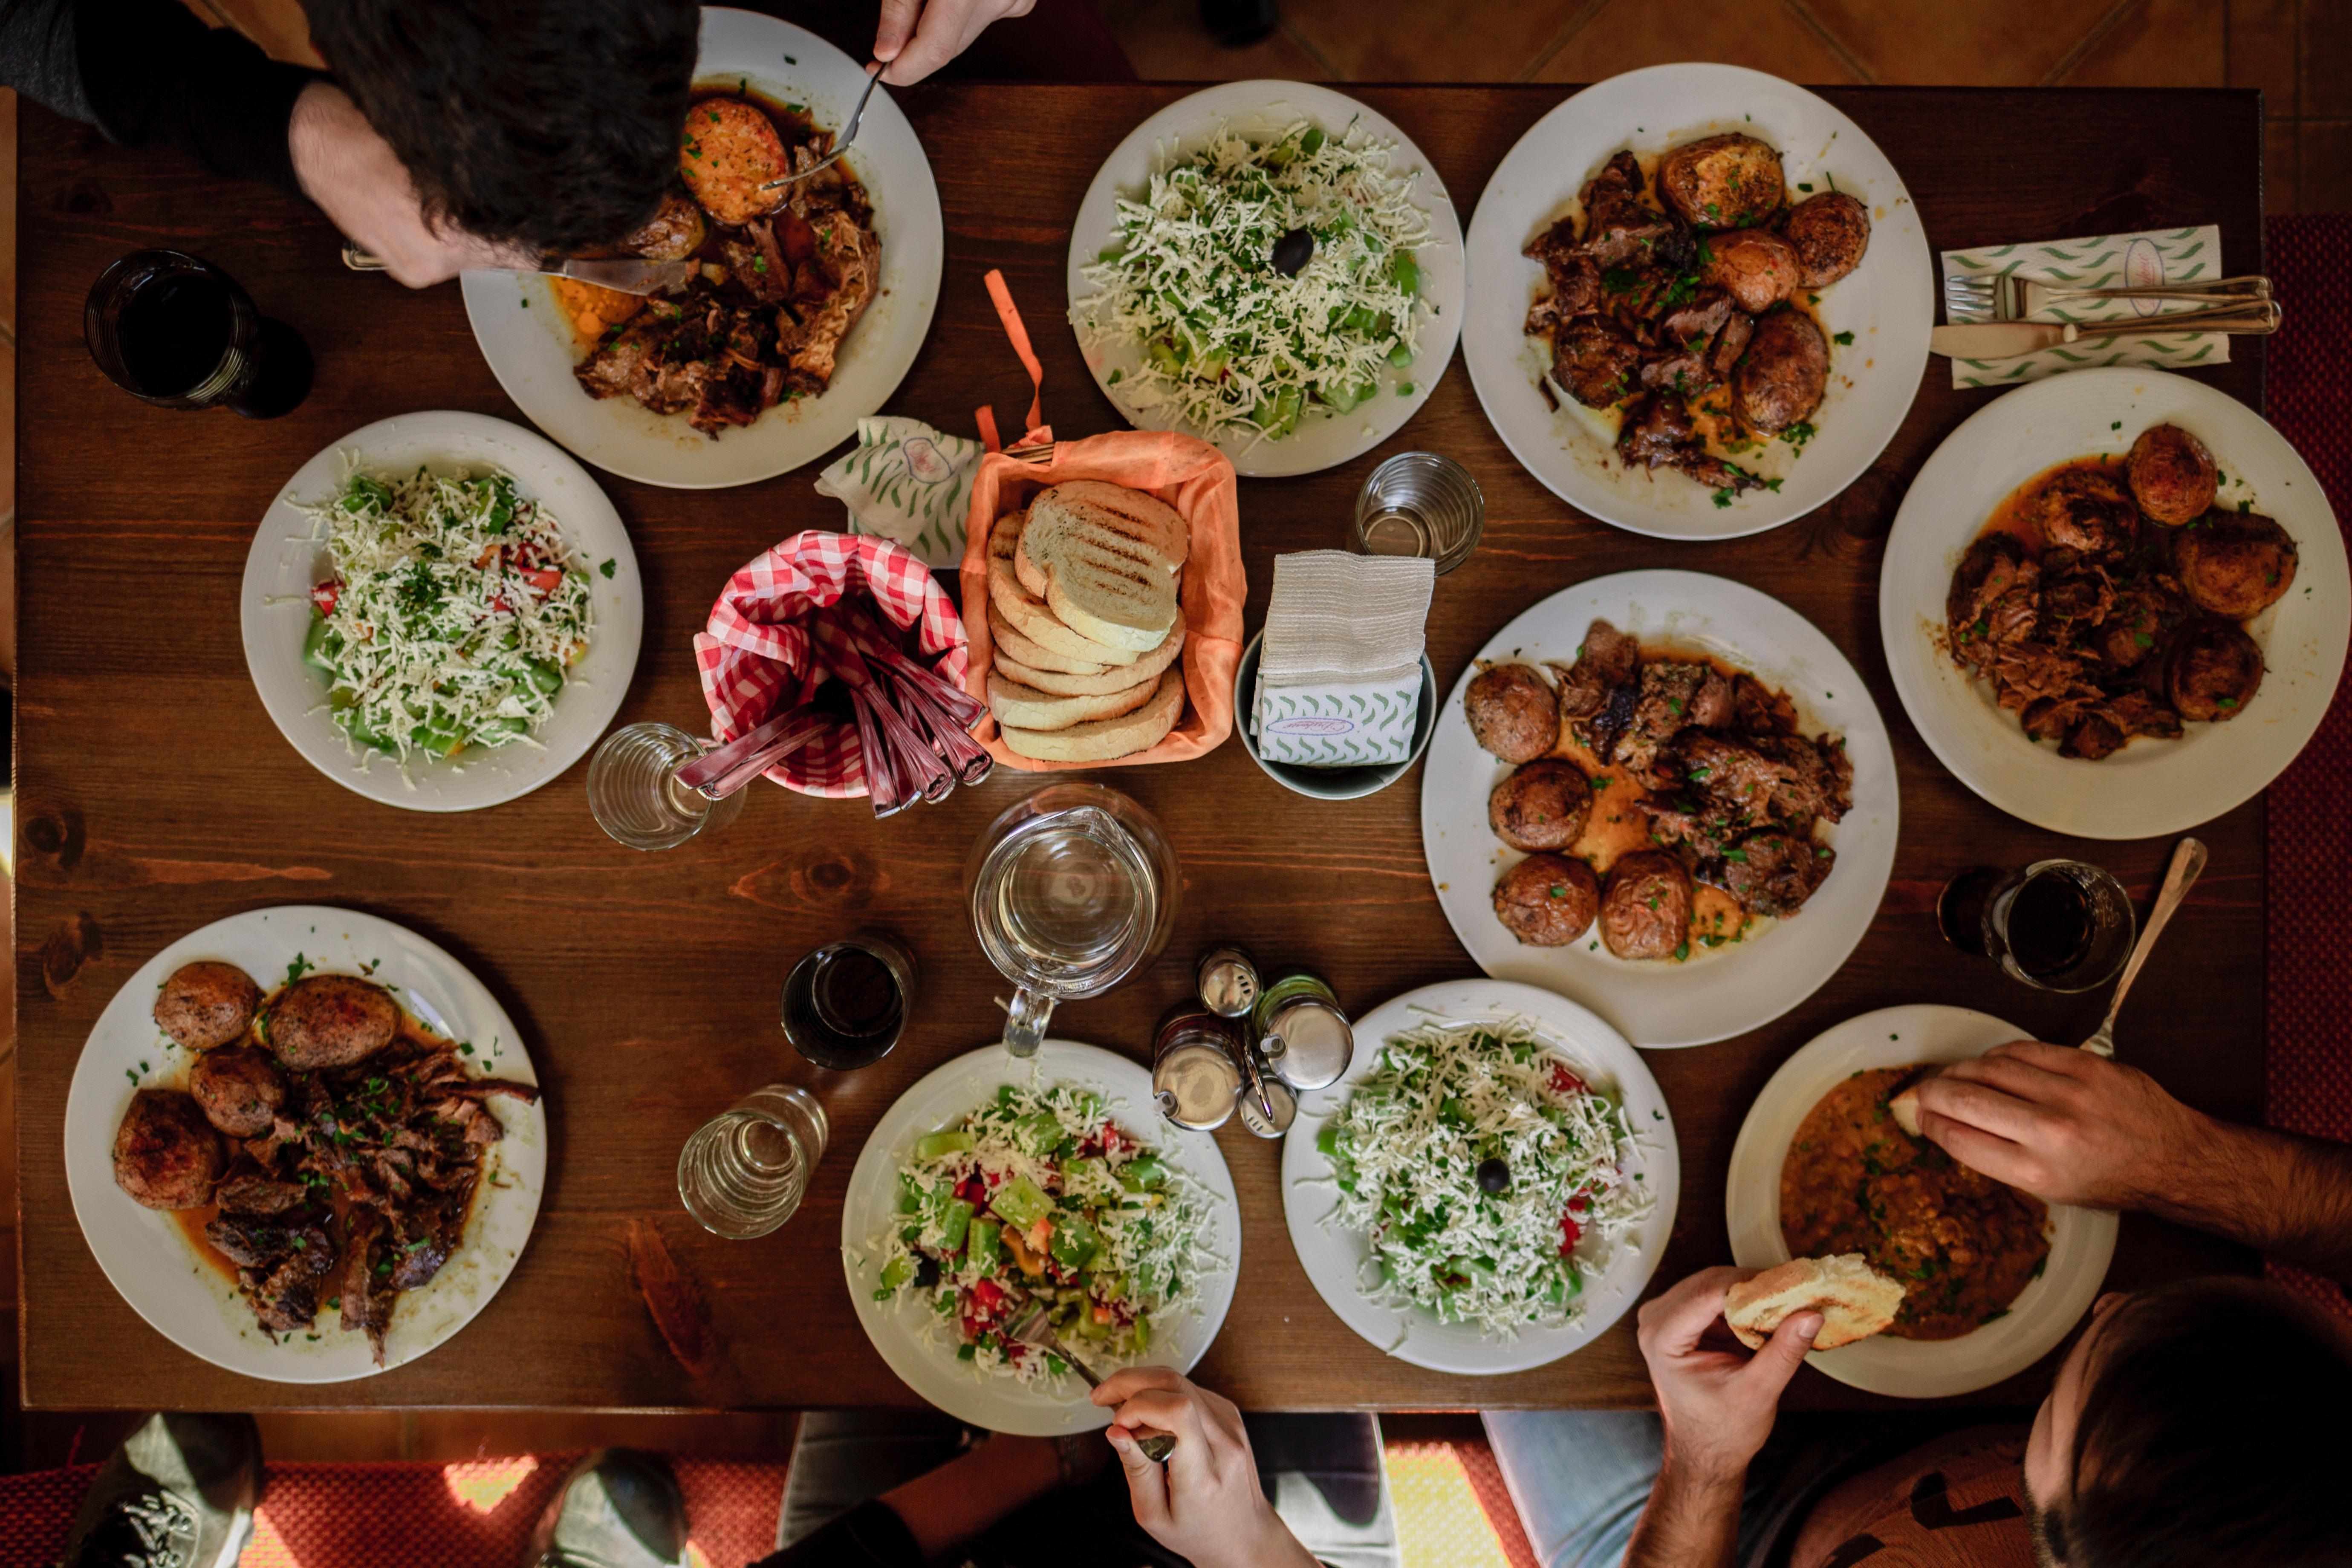 Modern Table Etiquette stefan-vladimirov-Q_Moi2xjieU-unsplash